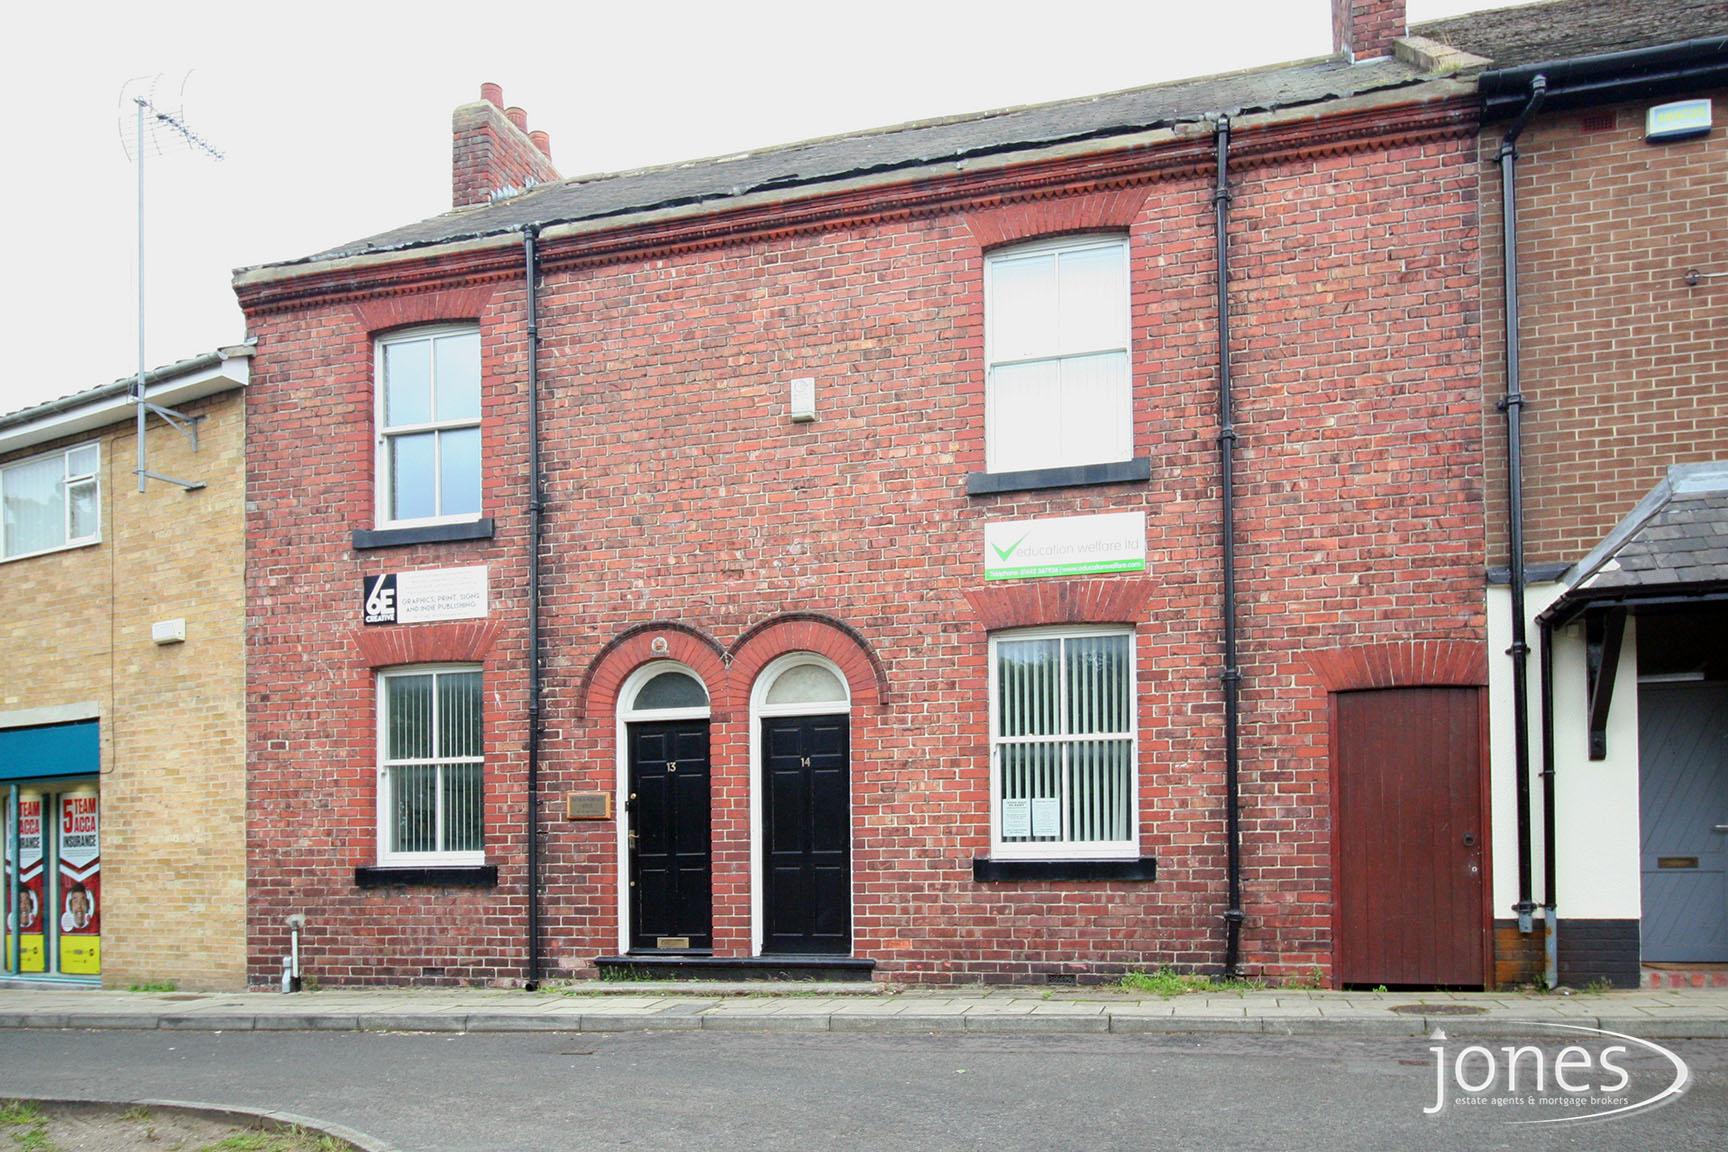 Home for Sale Let - Photo 01 The Green (Suite 2),Billingham TS23 1EU